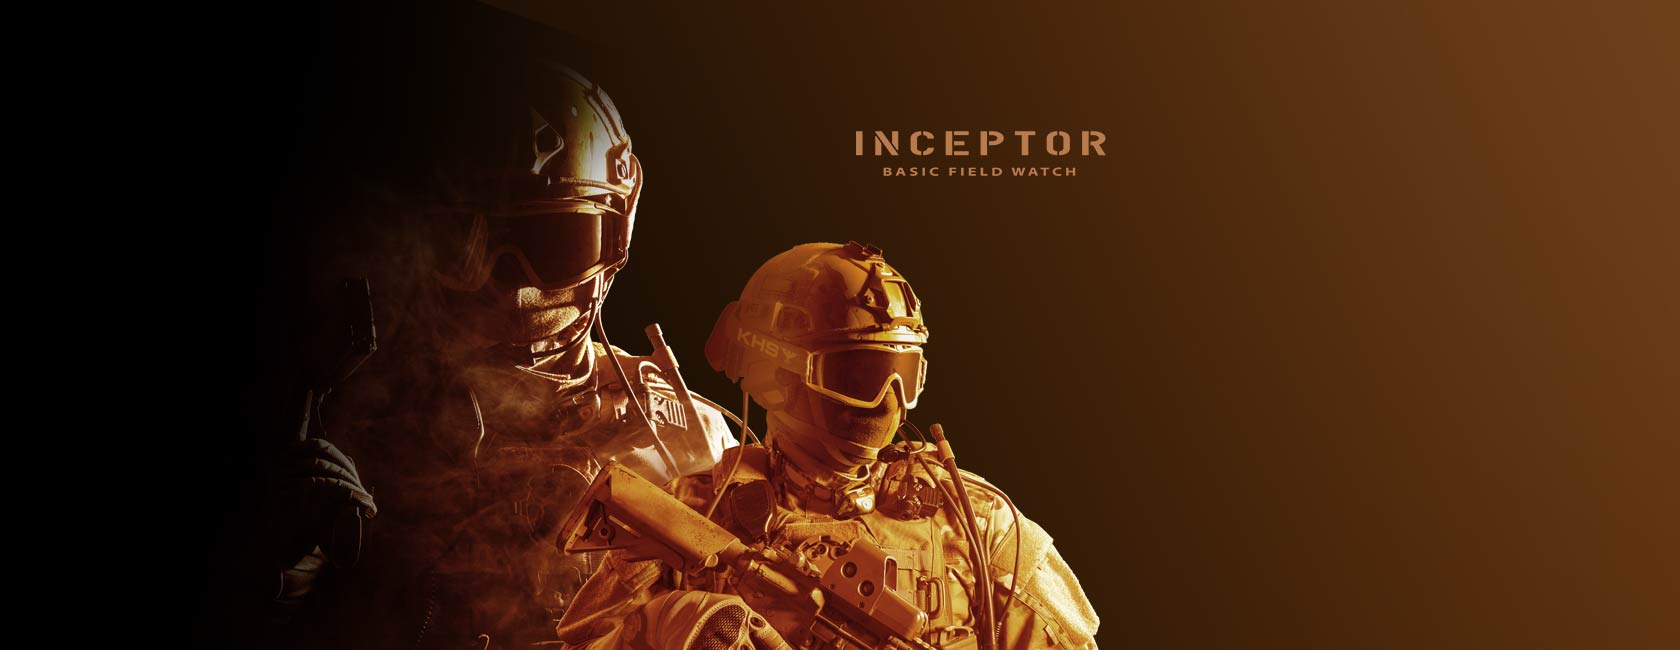 KHS Inceptor